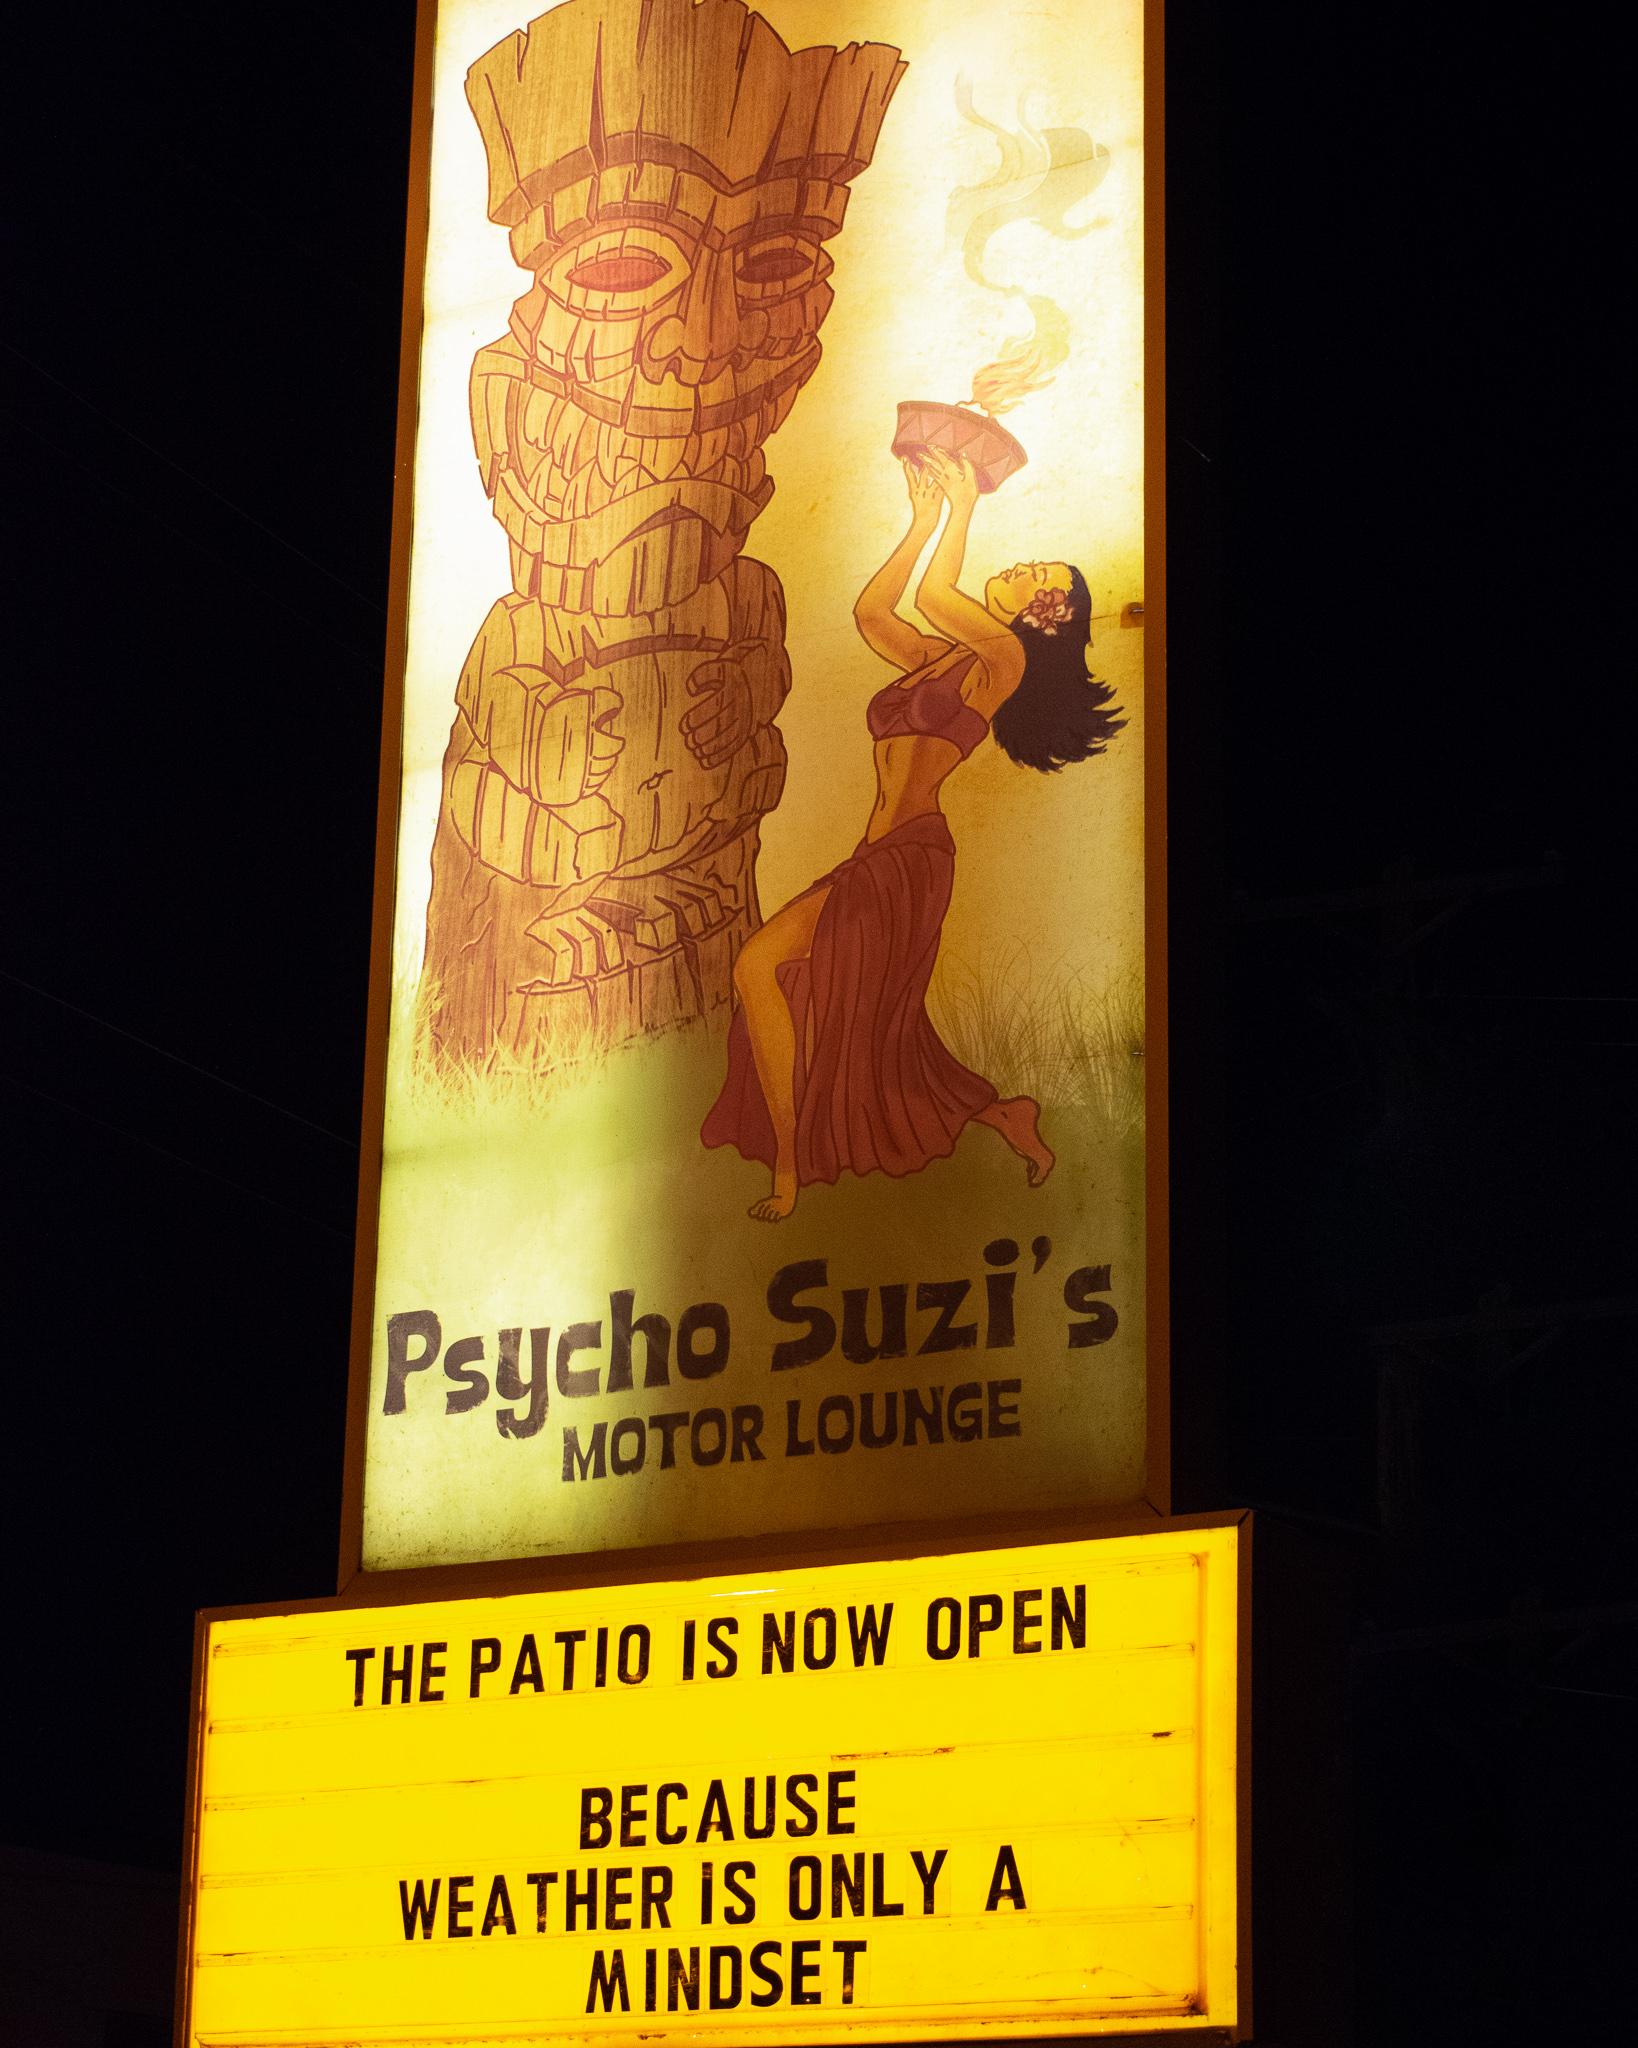 uprooted-traveler-psycho-suzis-minneapolis-st-paul-tiki-sign-motor-lounge.jpg